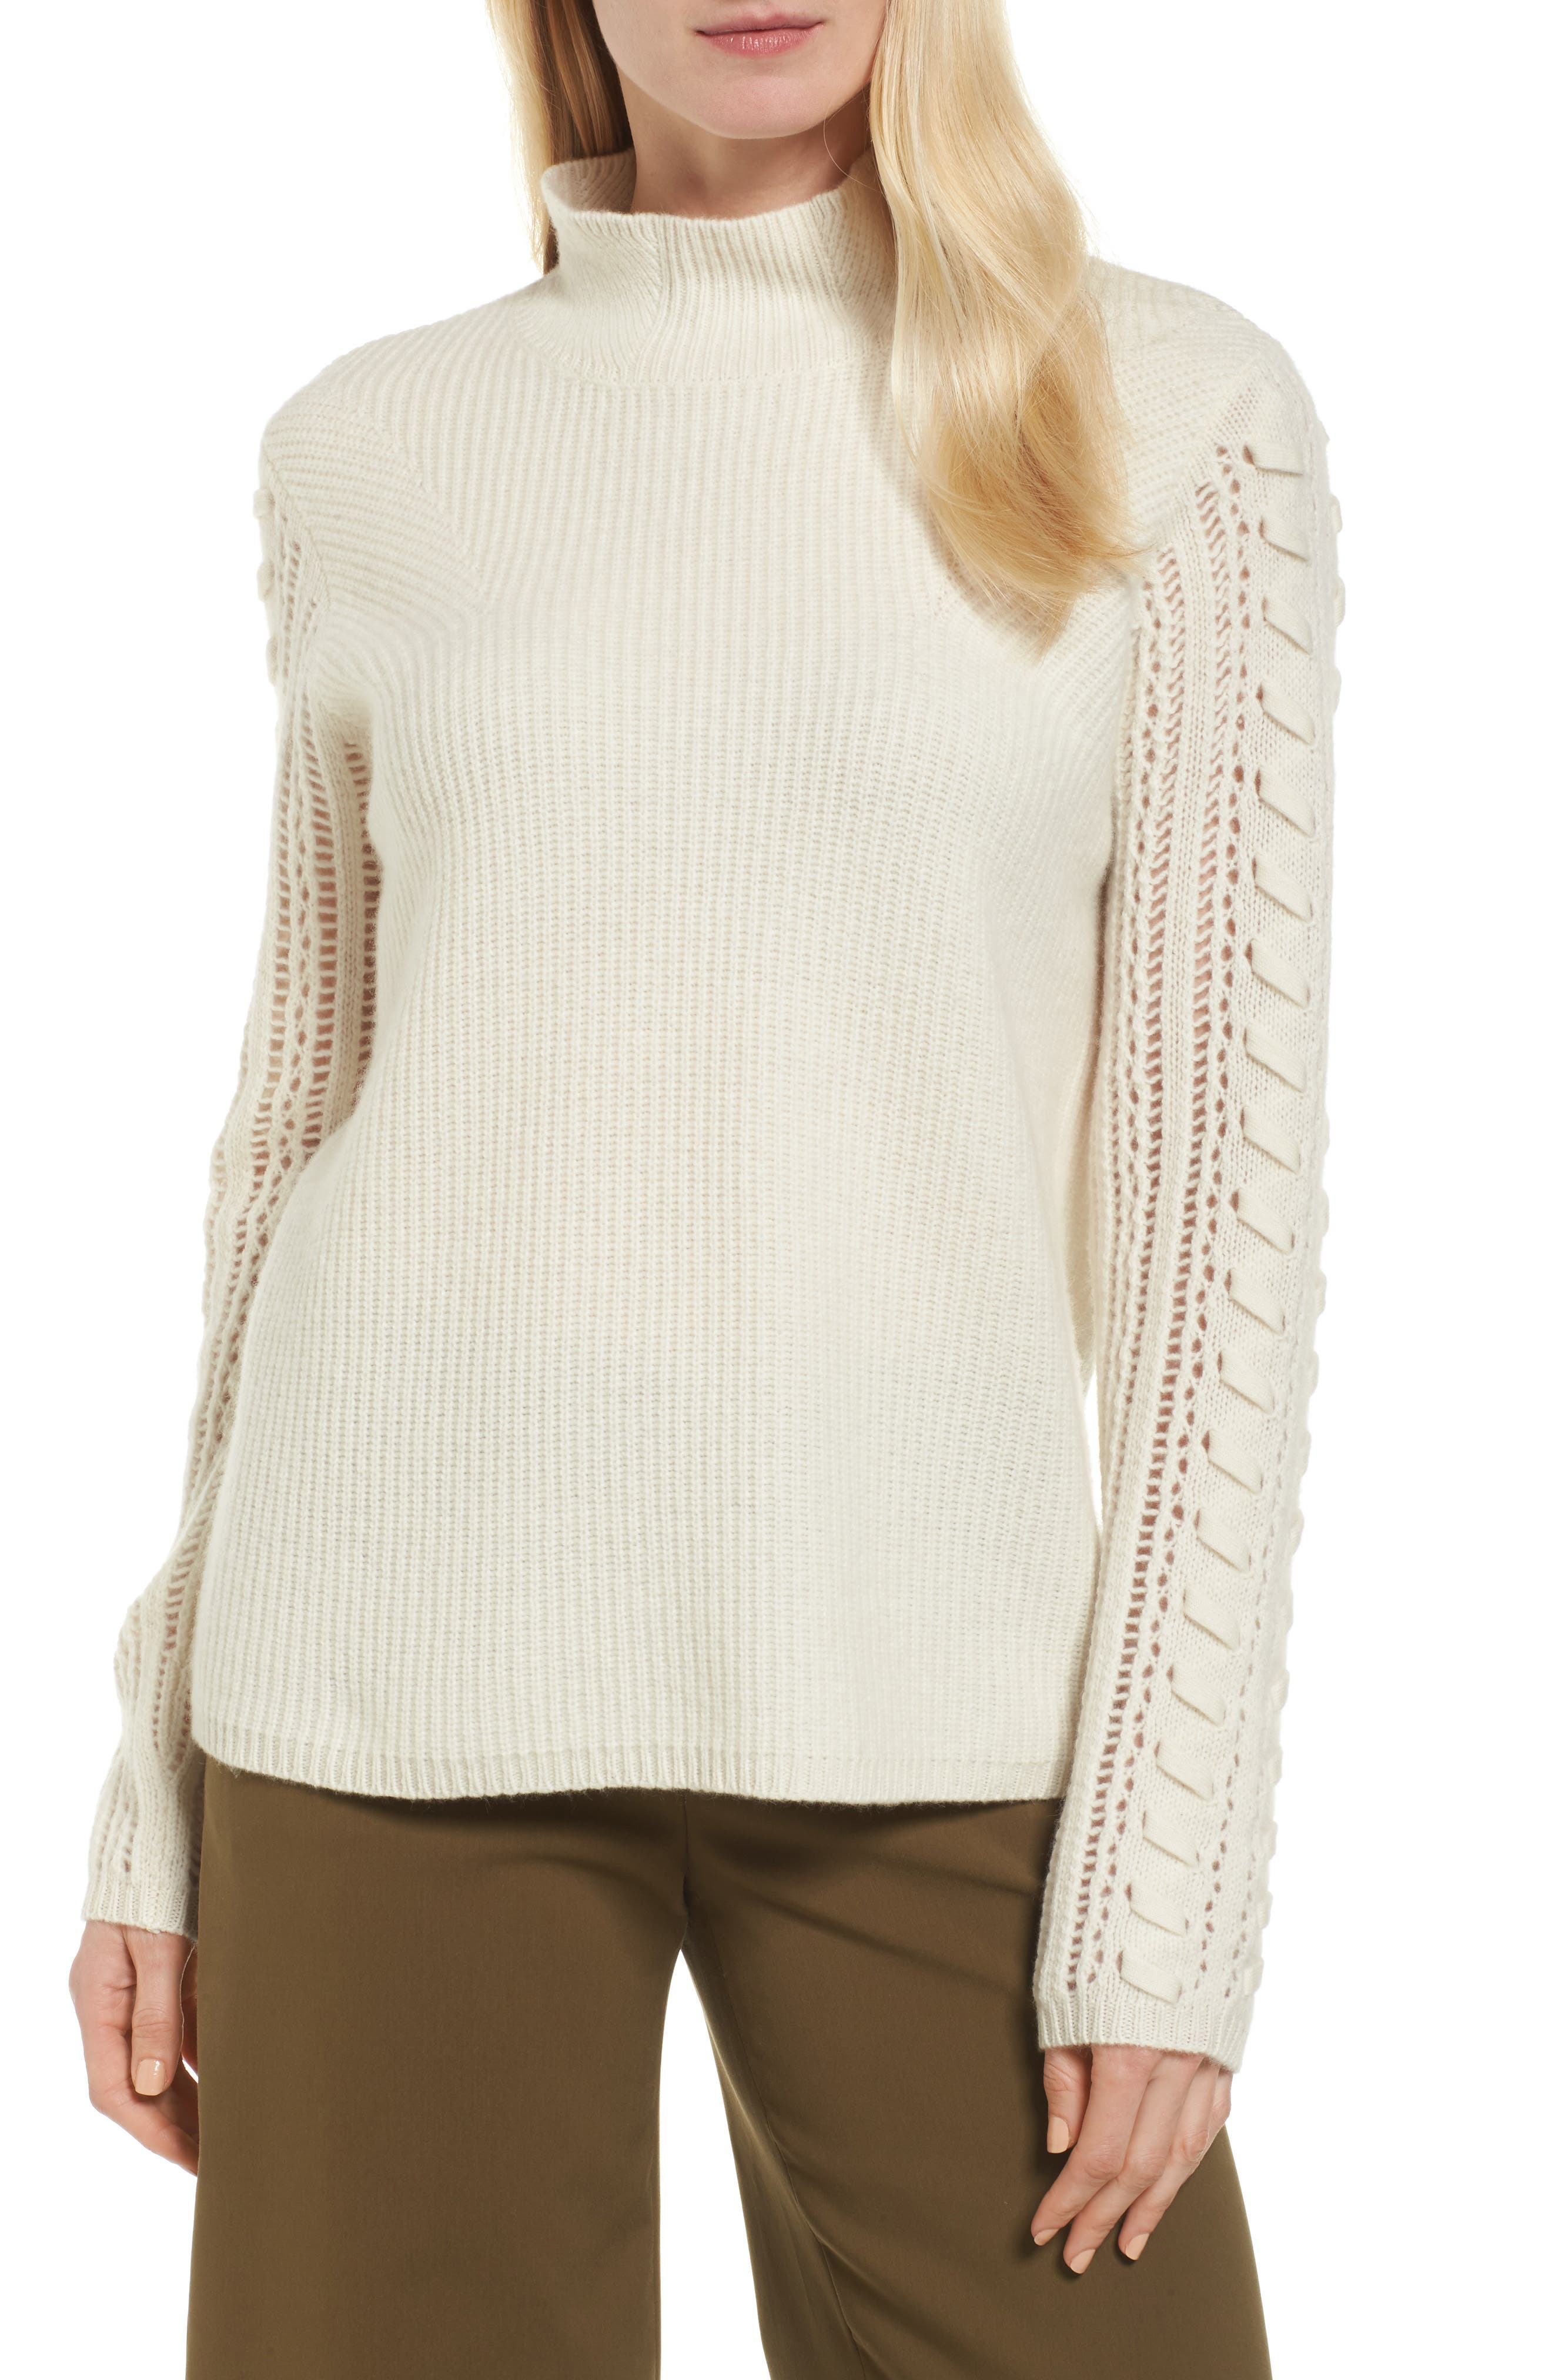 Emerson Rose Mixed Stitch Cashmere Sweater